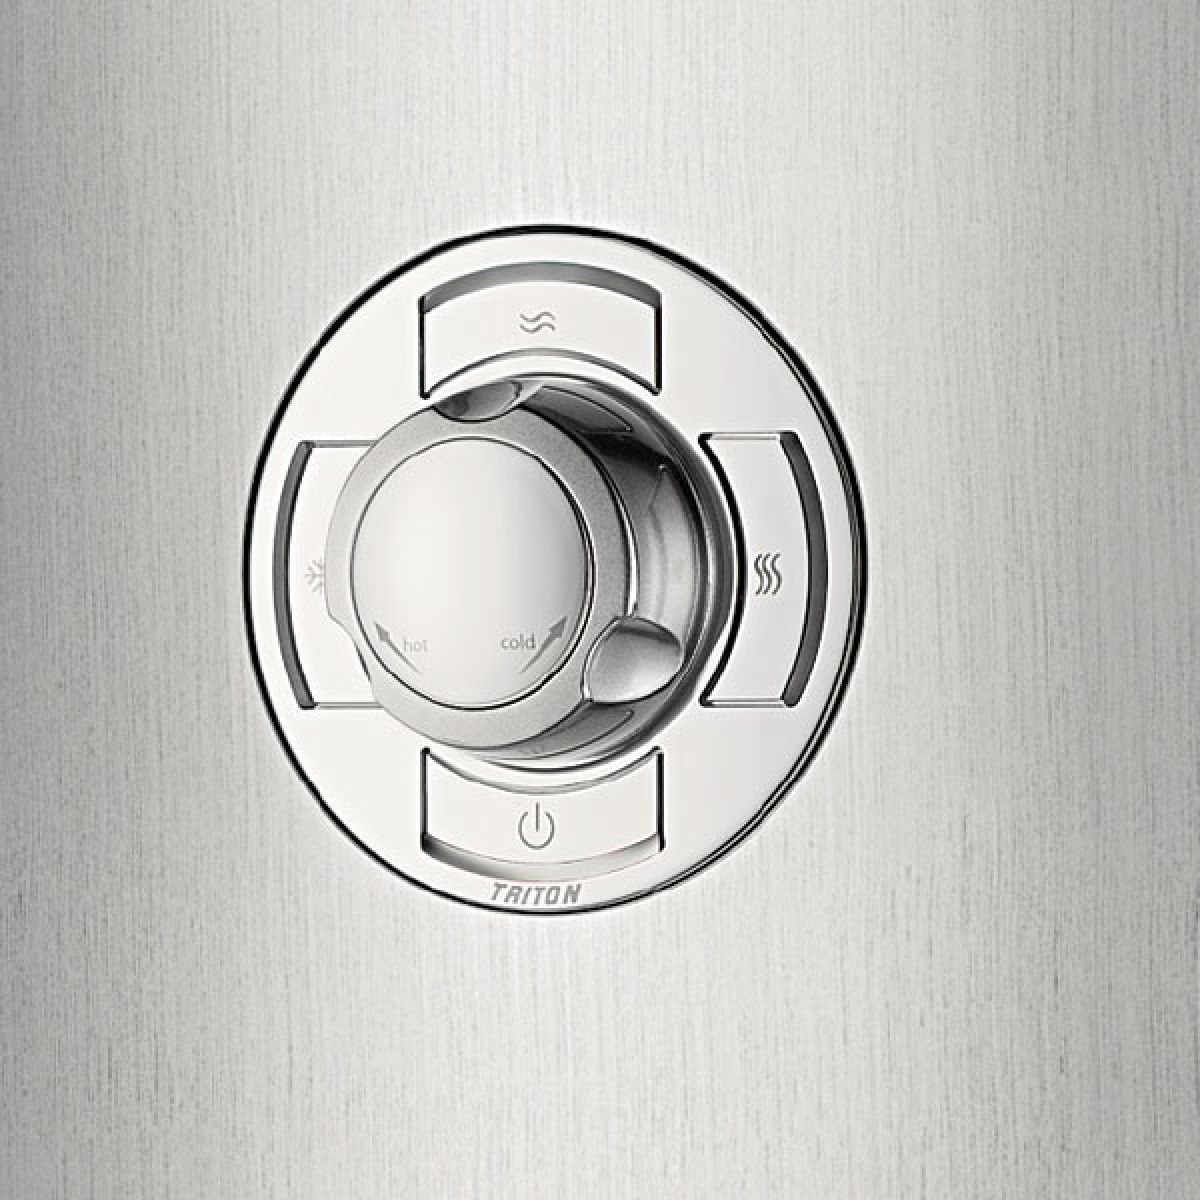 Triton Aspirante Brushed Steel Electric Shower Detail